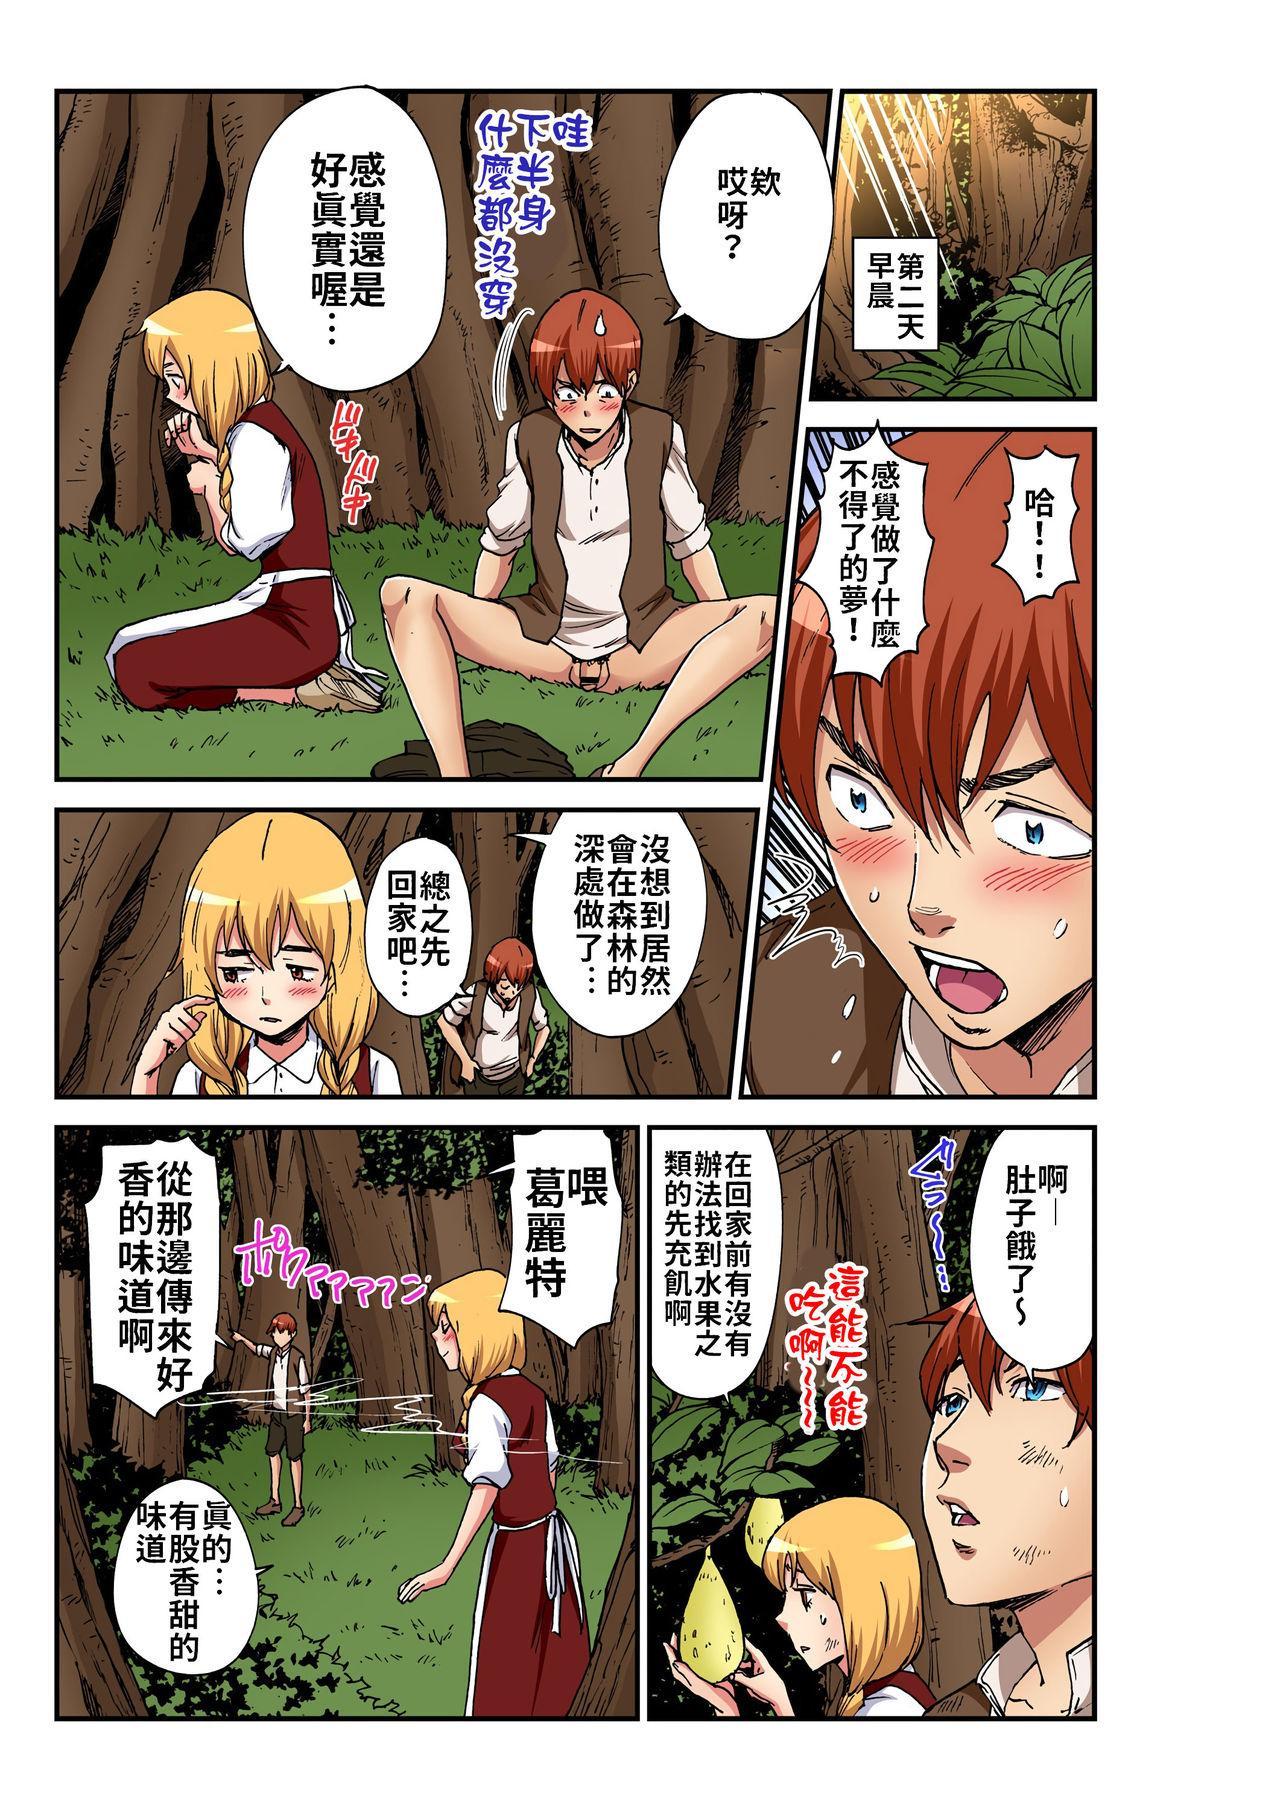 Otona no Douwa ~Henzeru to Gure-teru   大人的童話~糖果屋 13